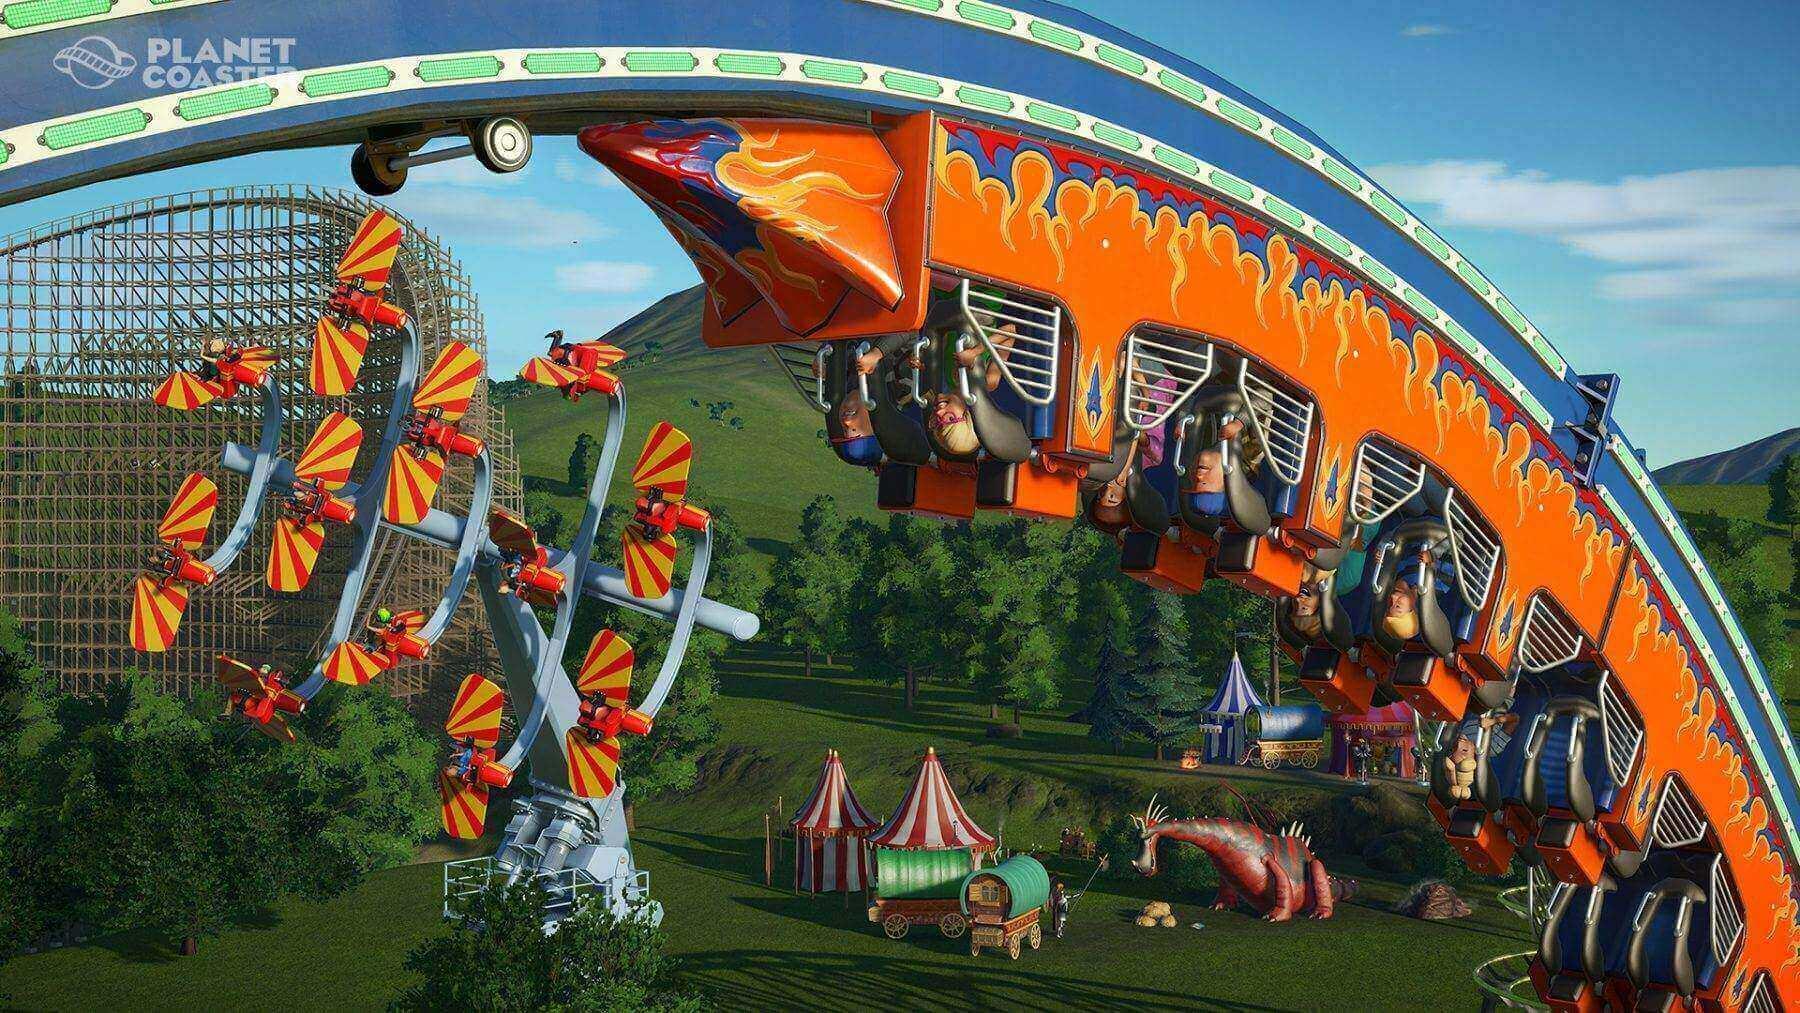 planet coaster,تحميل لعبة planet coaster,شرح تحميل لعبة planet coaster,كيف تحميل لعبة planet coaster,لعبة planet coaster,تحميل لعبة planet coaster كاملة,تحميل لعبة planet coaster بحجم صغير,تحميل لعبة planet coaster من ميديا فاير,planet coaster تحميل لعبة,تحميل لعبة planet coaster مجانا,تحميل لعبه planet coaster للاندرويد,لعبة planet coaster كاملة ومضغوطة,تحميل لعبة,طريقة تحميل لعبة planet coaster,كيفية تحميل لعبة planet coaster,تحميل لعبة planet coaster تورنت,تحميل لعبة planet coaster مضغوطة